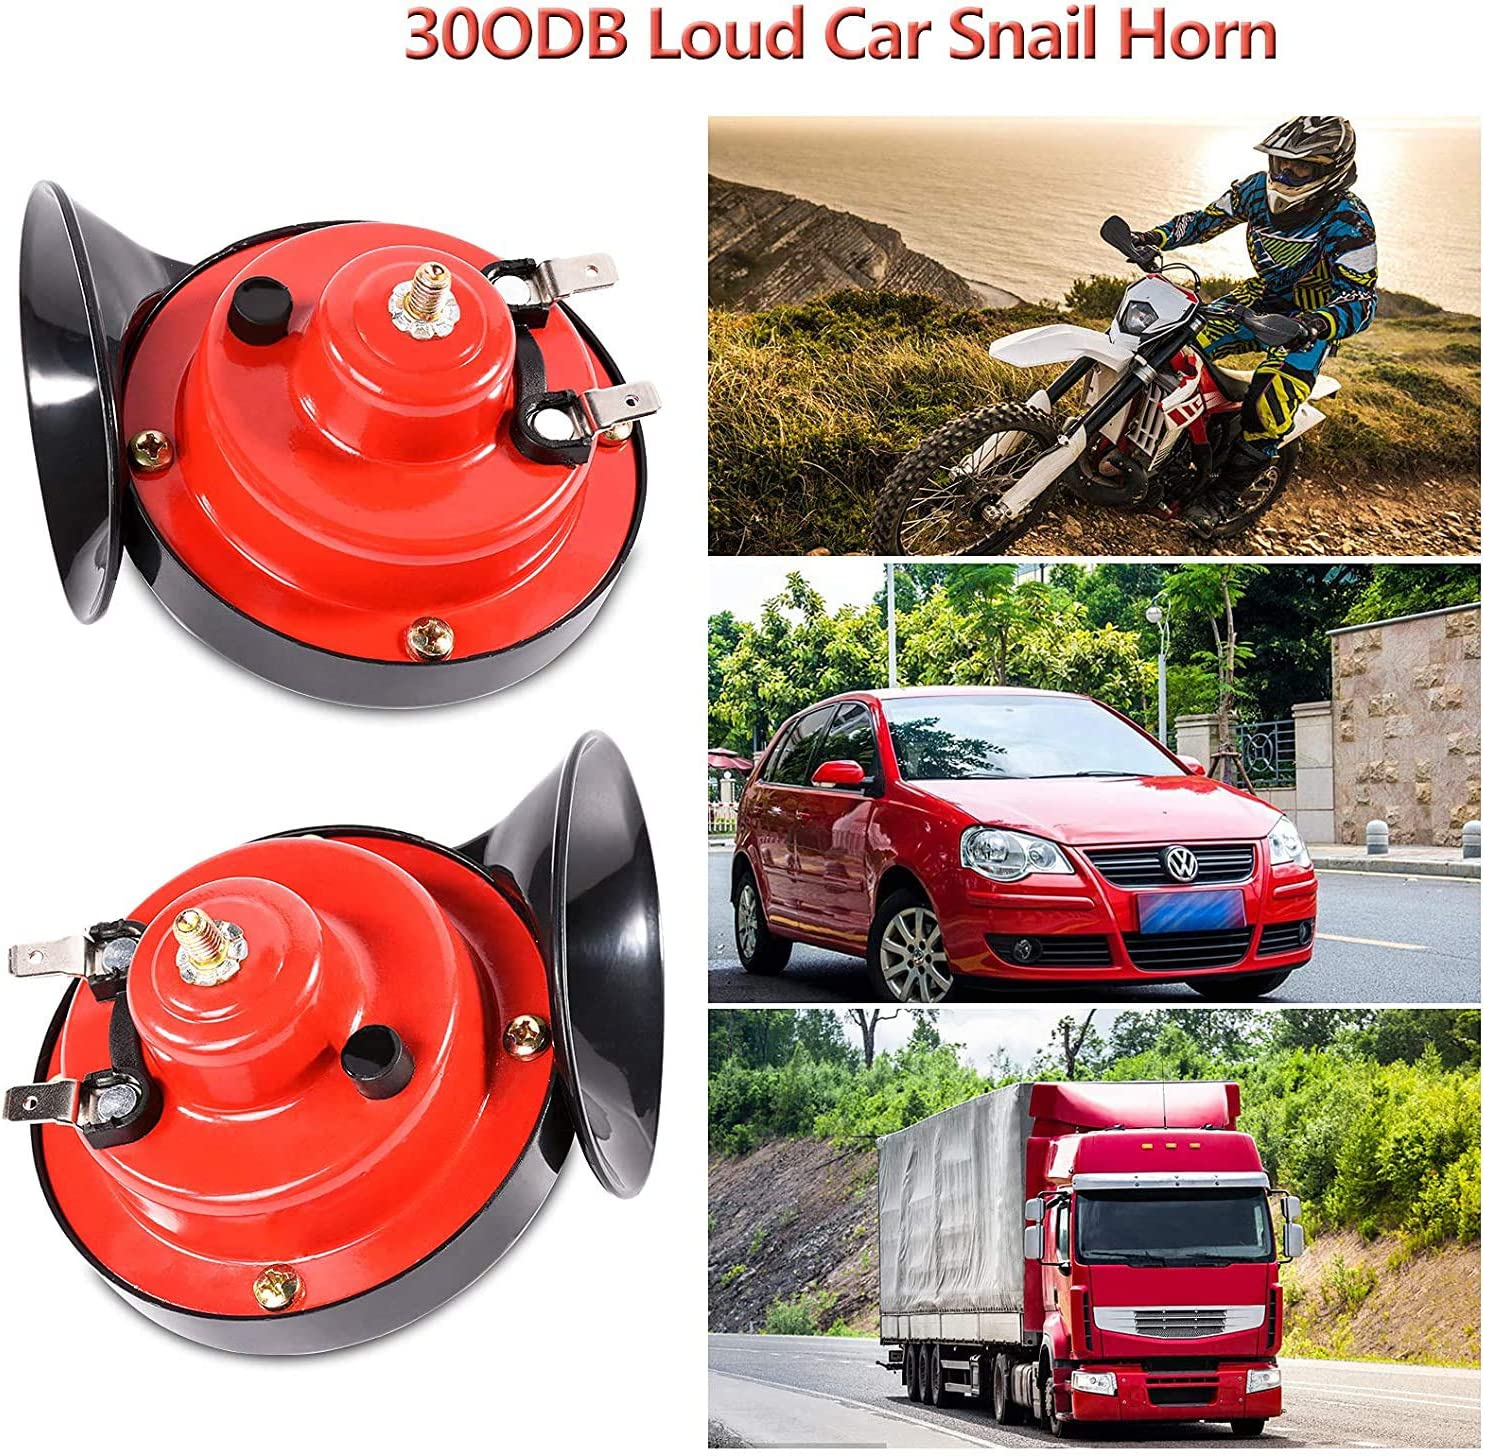 Motorcycle MASALING 2Pcs 300db Train Horn for Trucks,24V Super Loud Air Electric Snail Horn Waterproof Train Horns Kit for Trucks Cars Bikes /& Boats